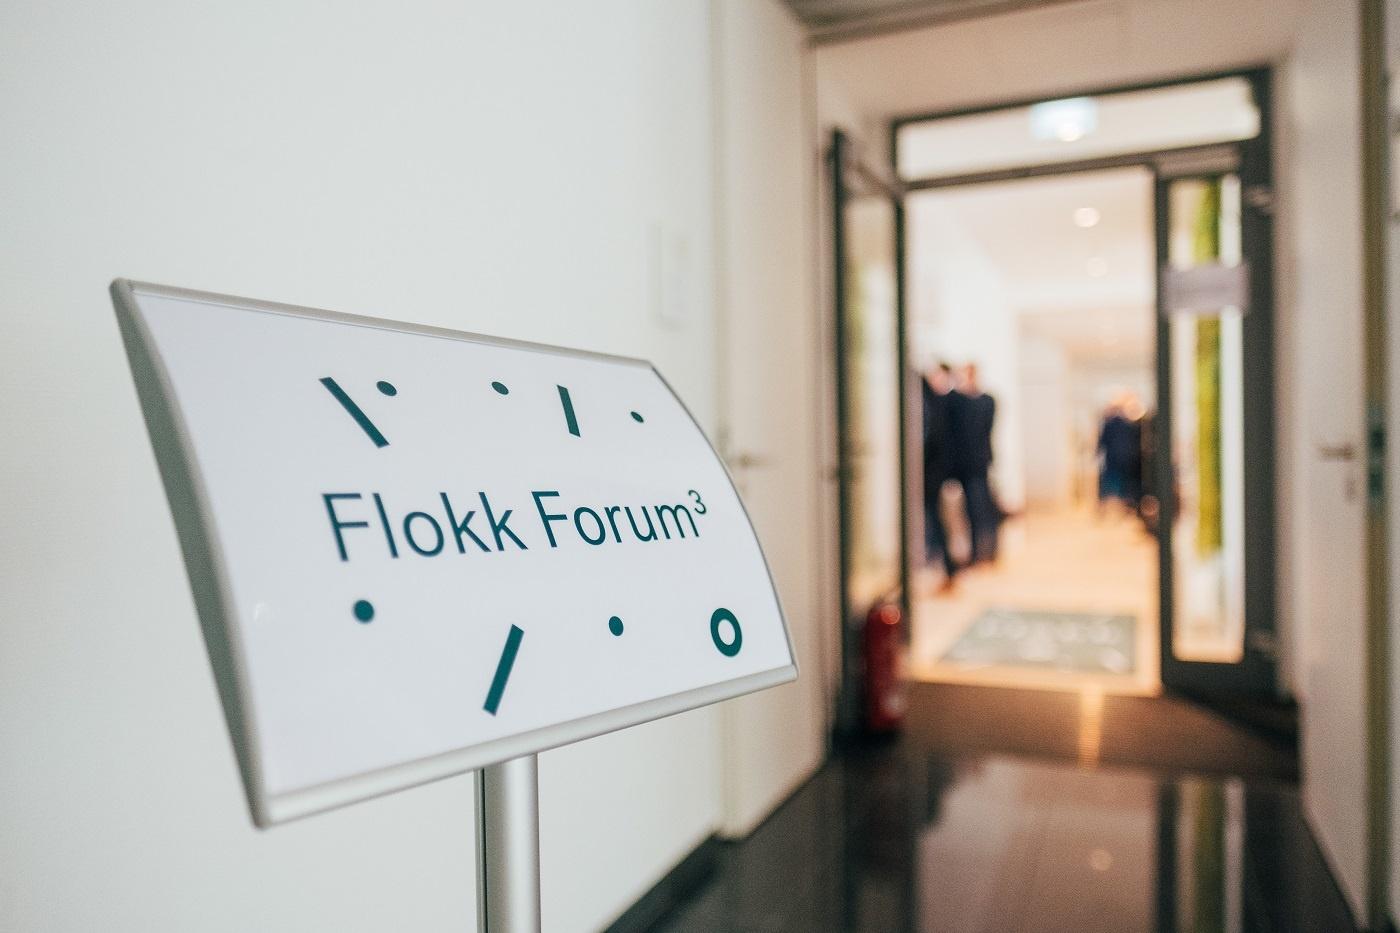 180621_FLOKK-Forum3_033_resize2